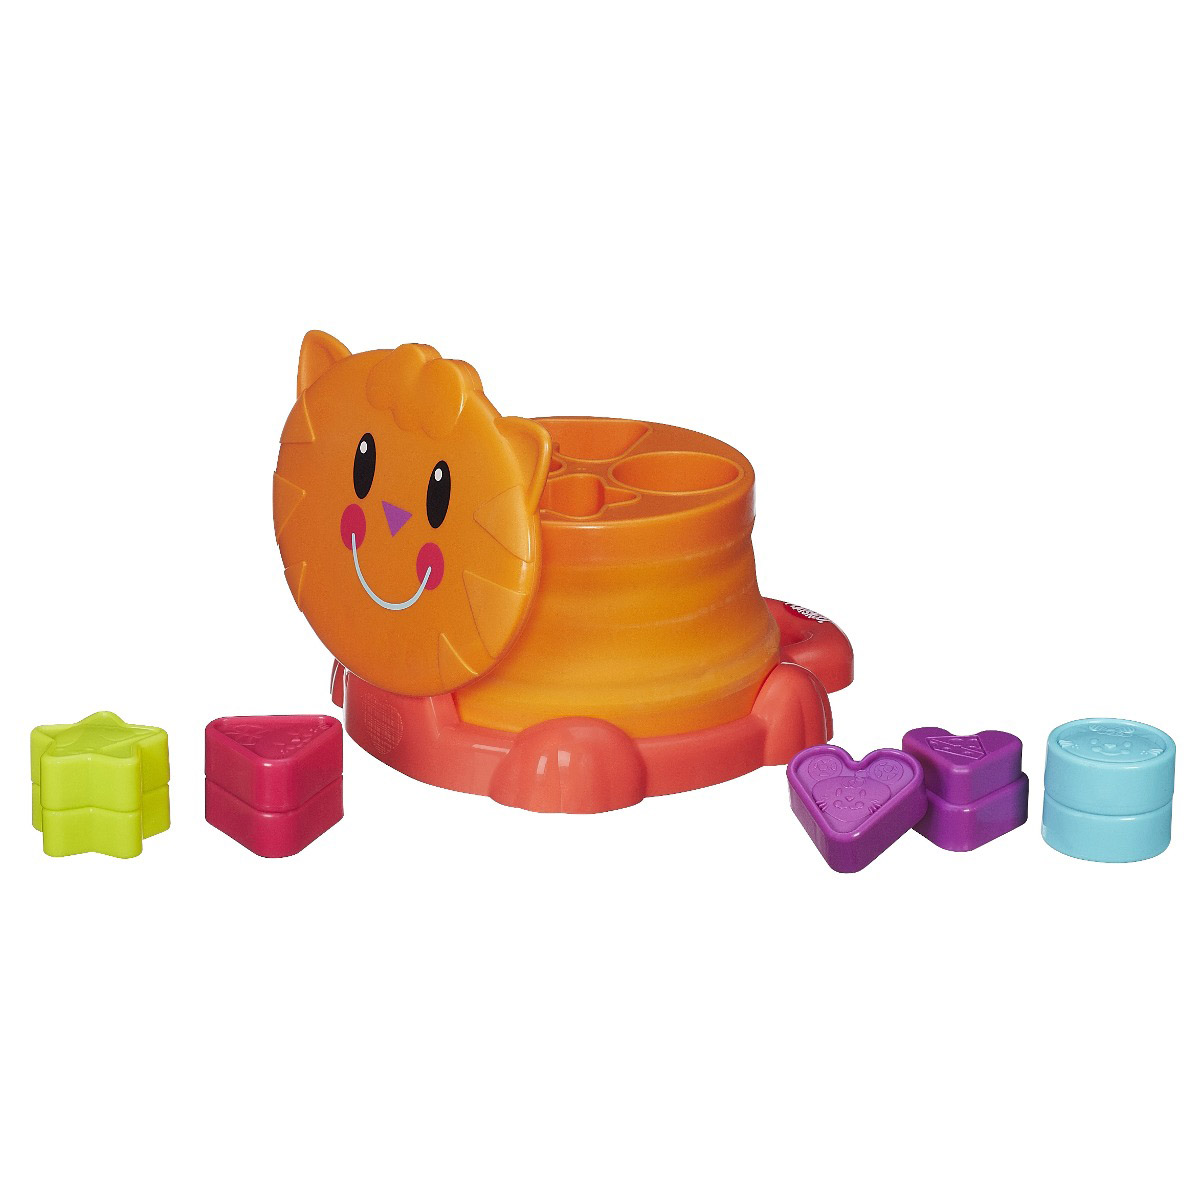 Gatinho com Formas Playskool Hasbro